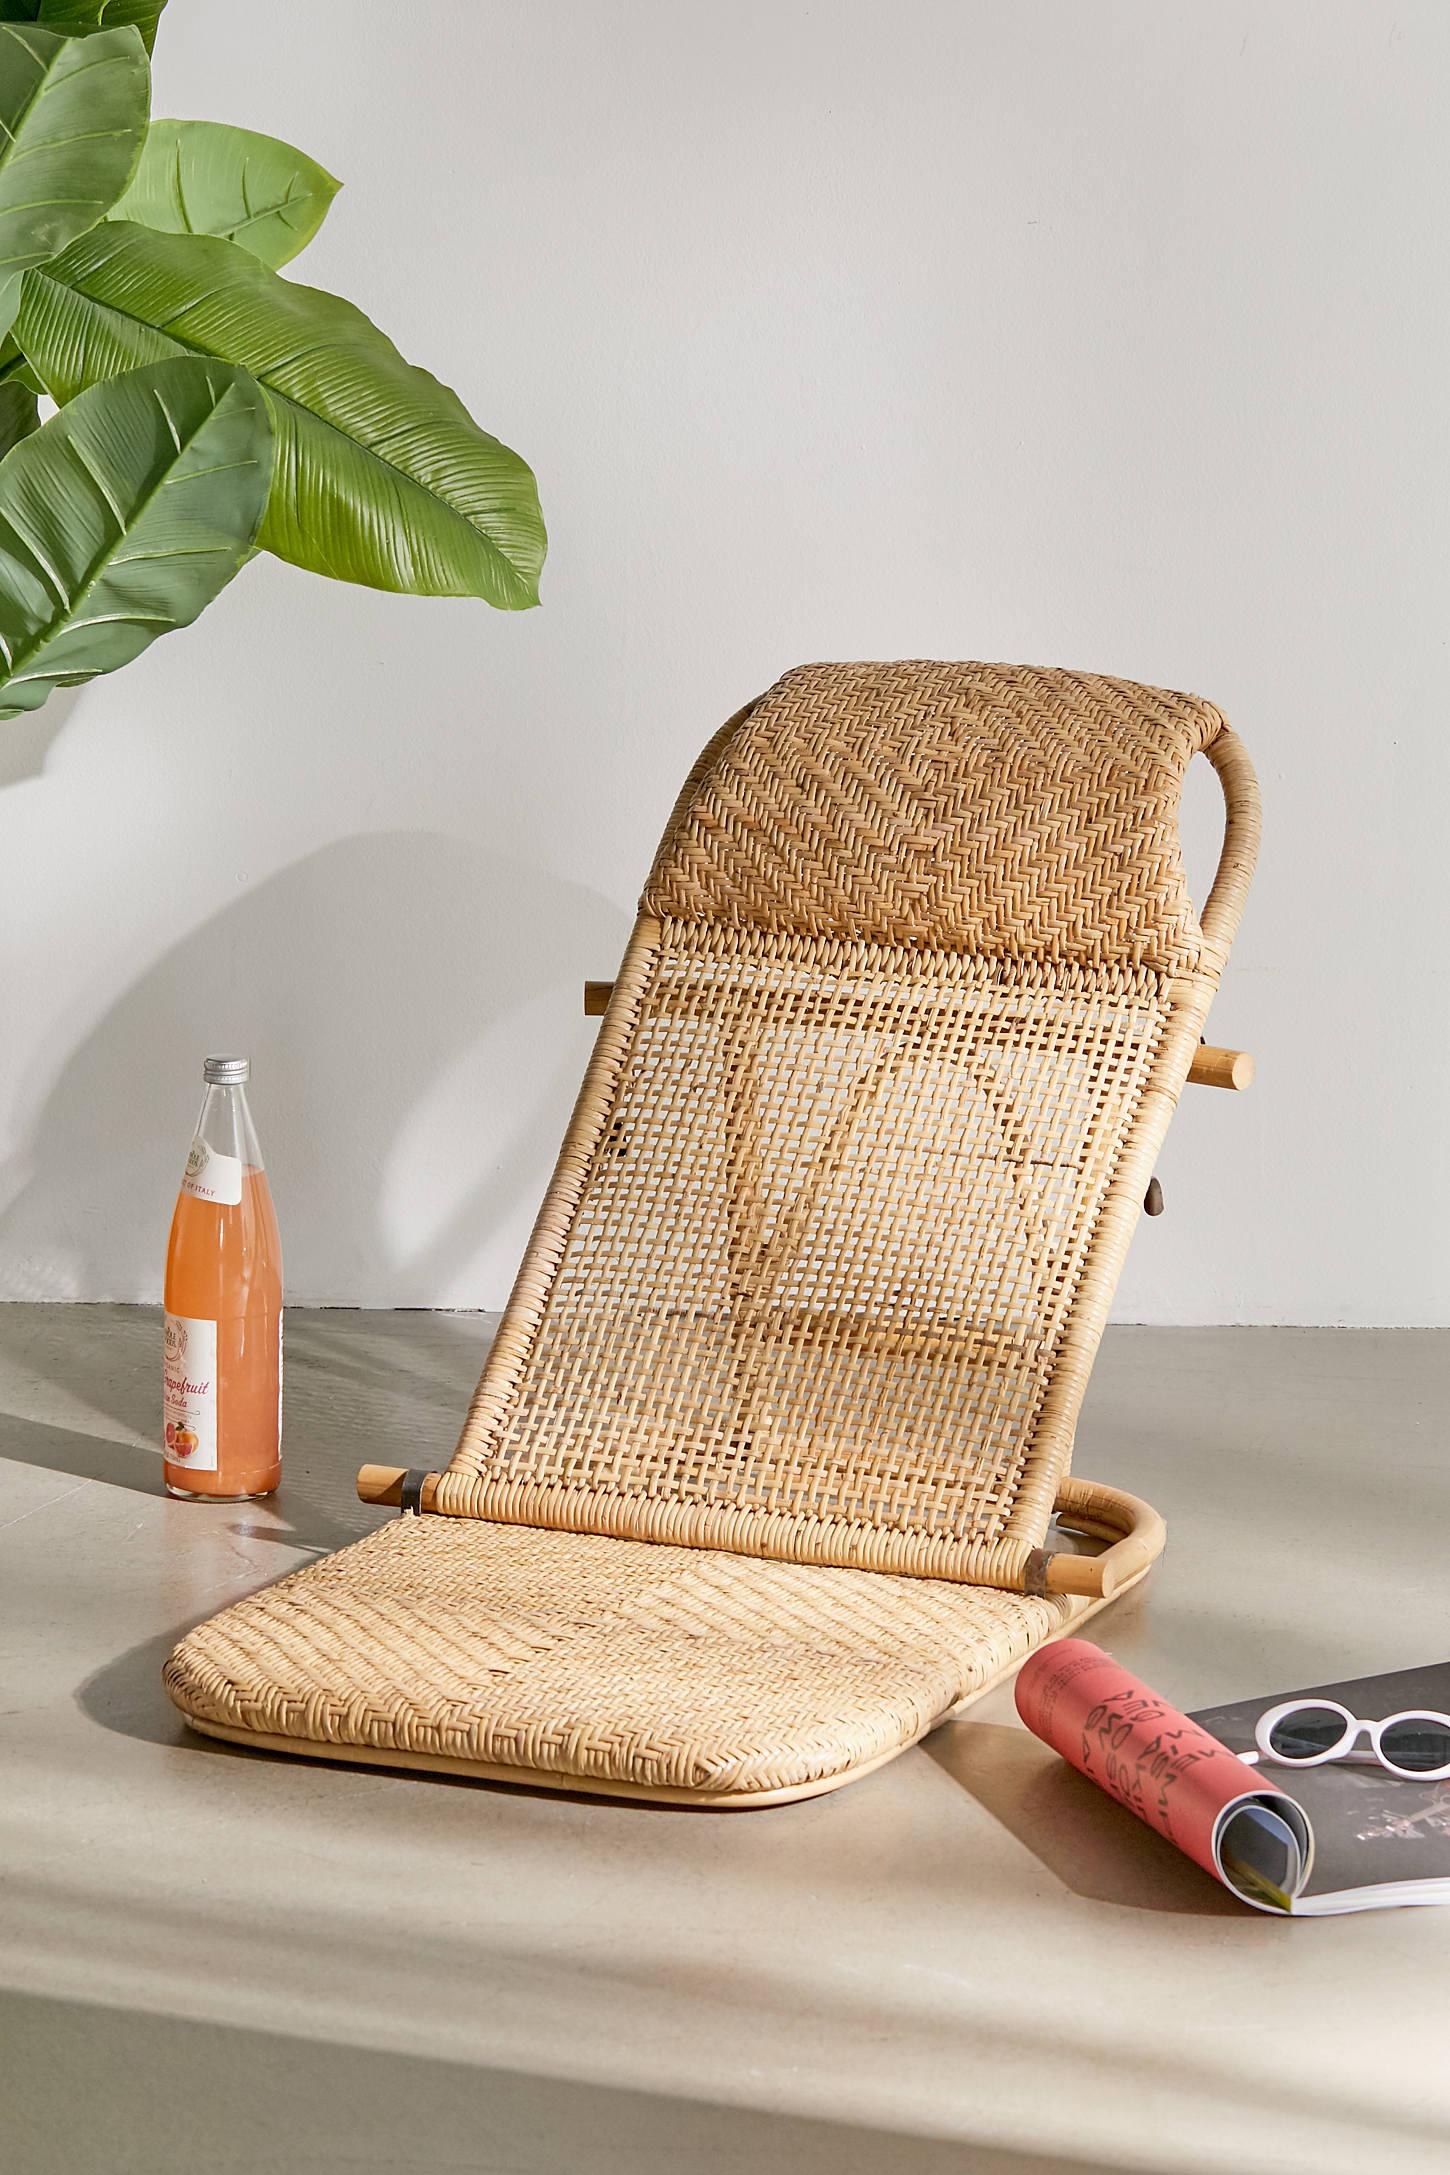 Best Beach Chairs For Outdoor Summer Activities 2020